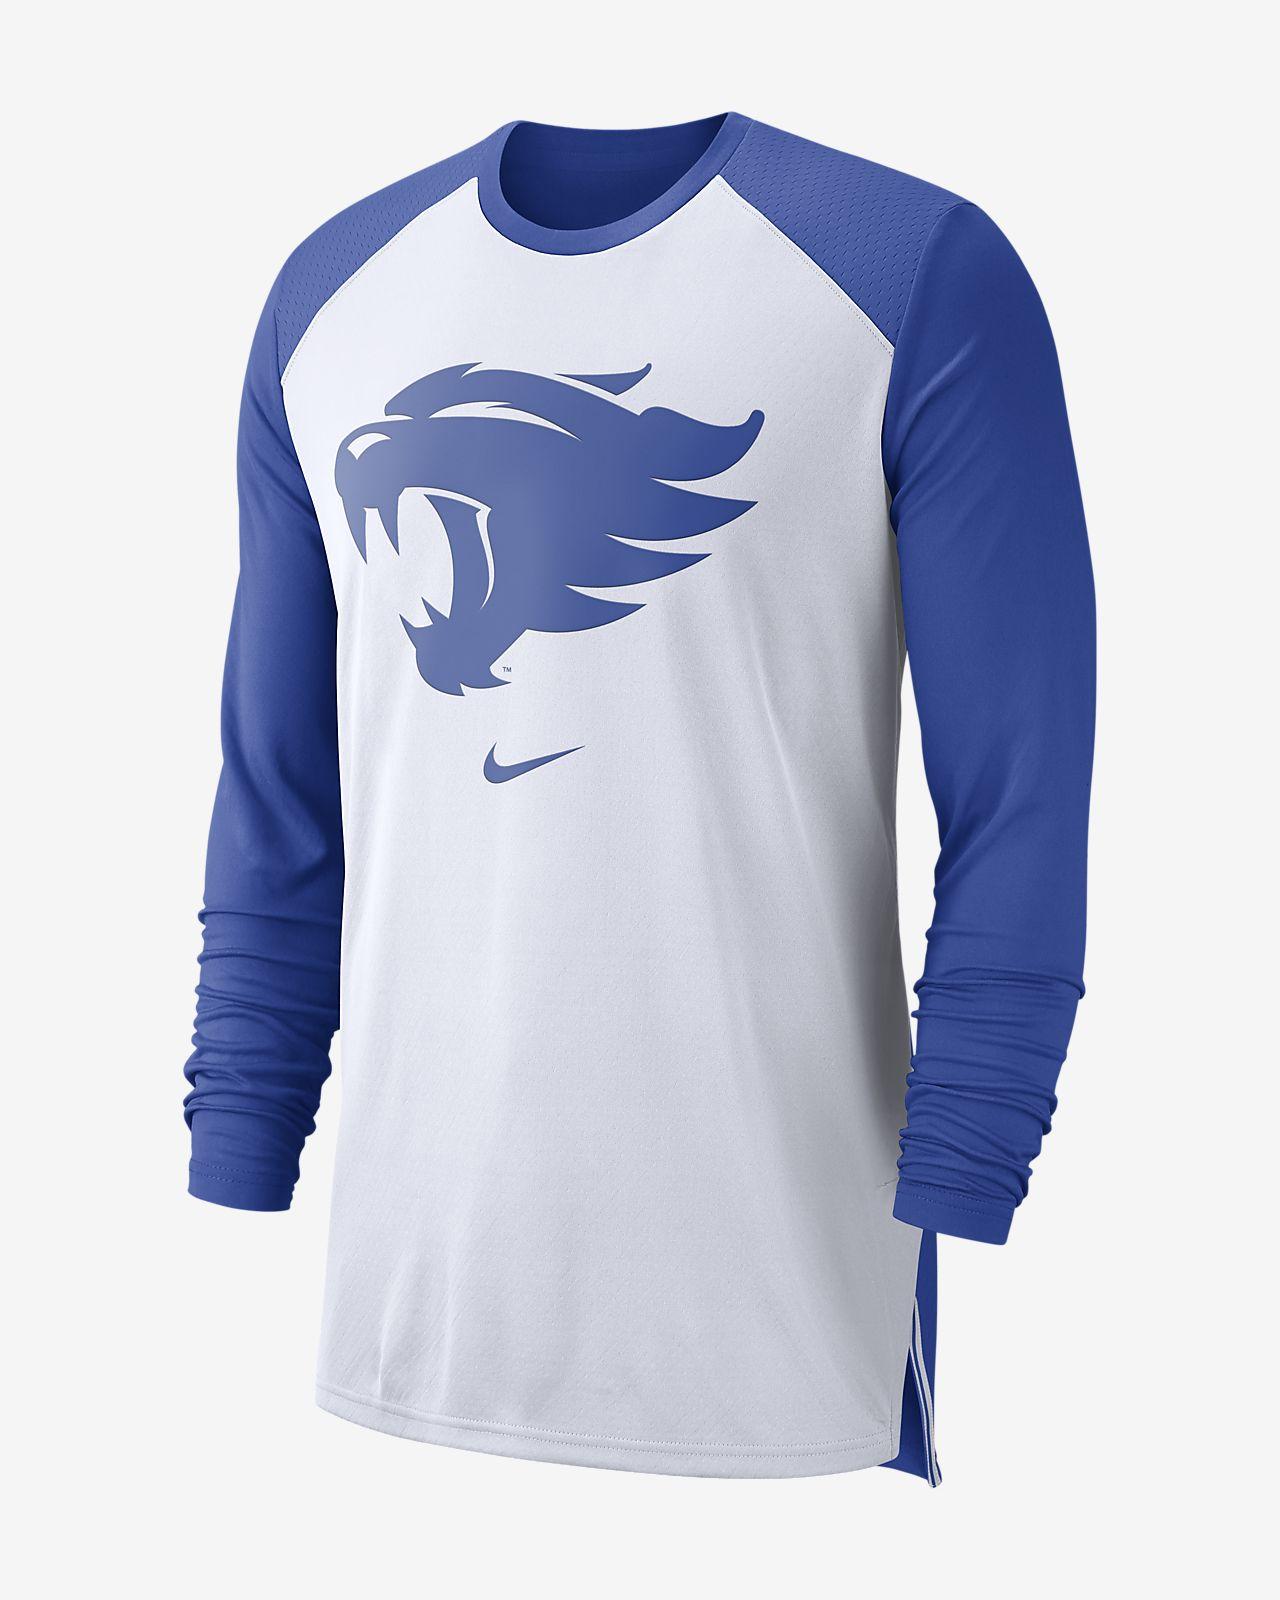 Nike College Dri-FIT (Kentucky) Men's Long-Sleeve Basketball Top